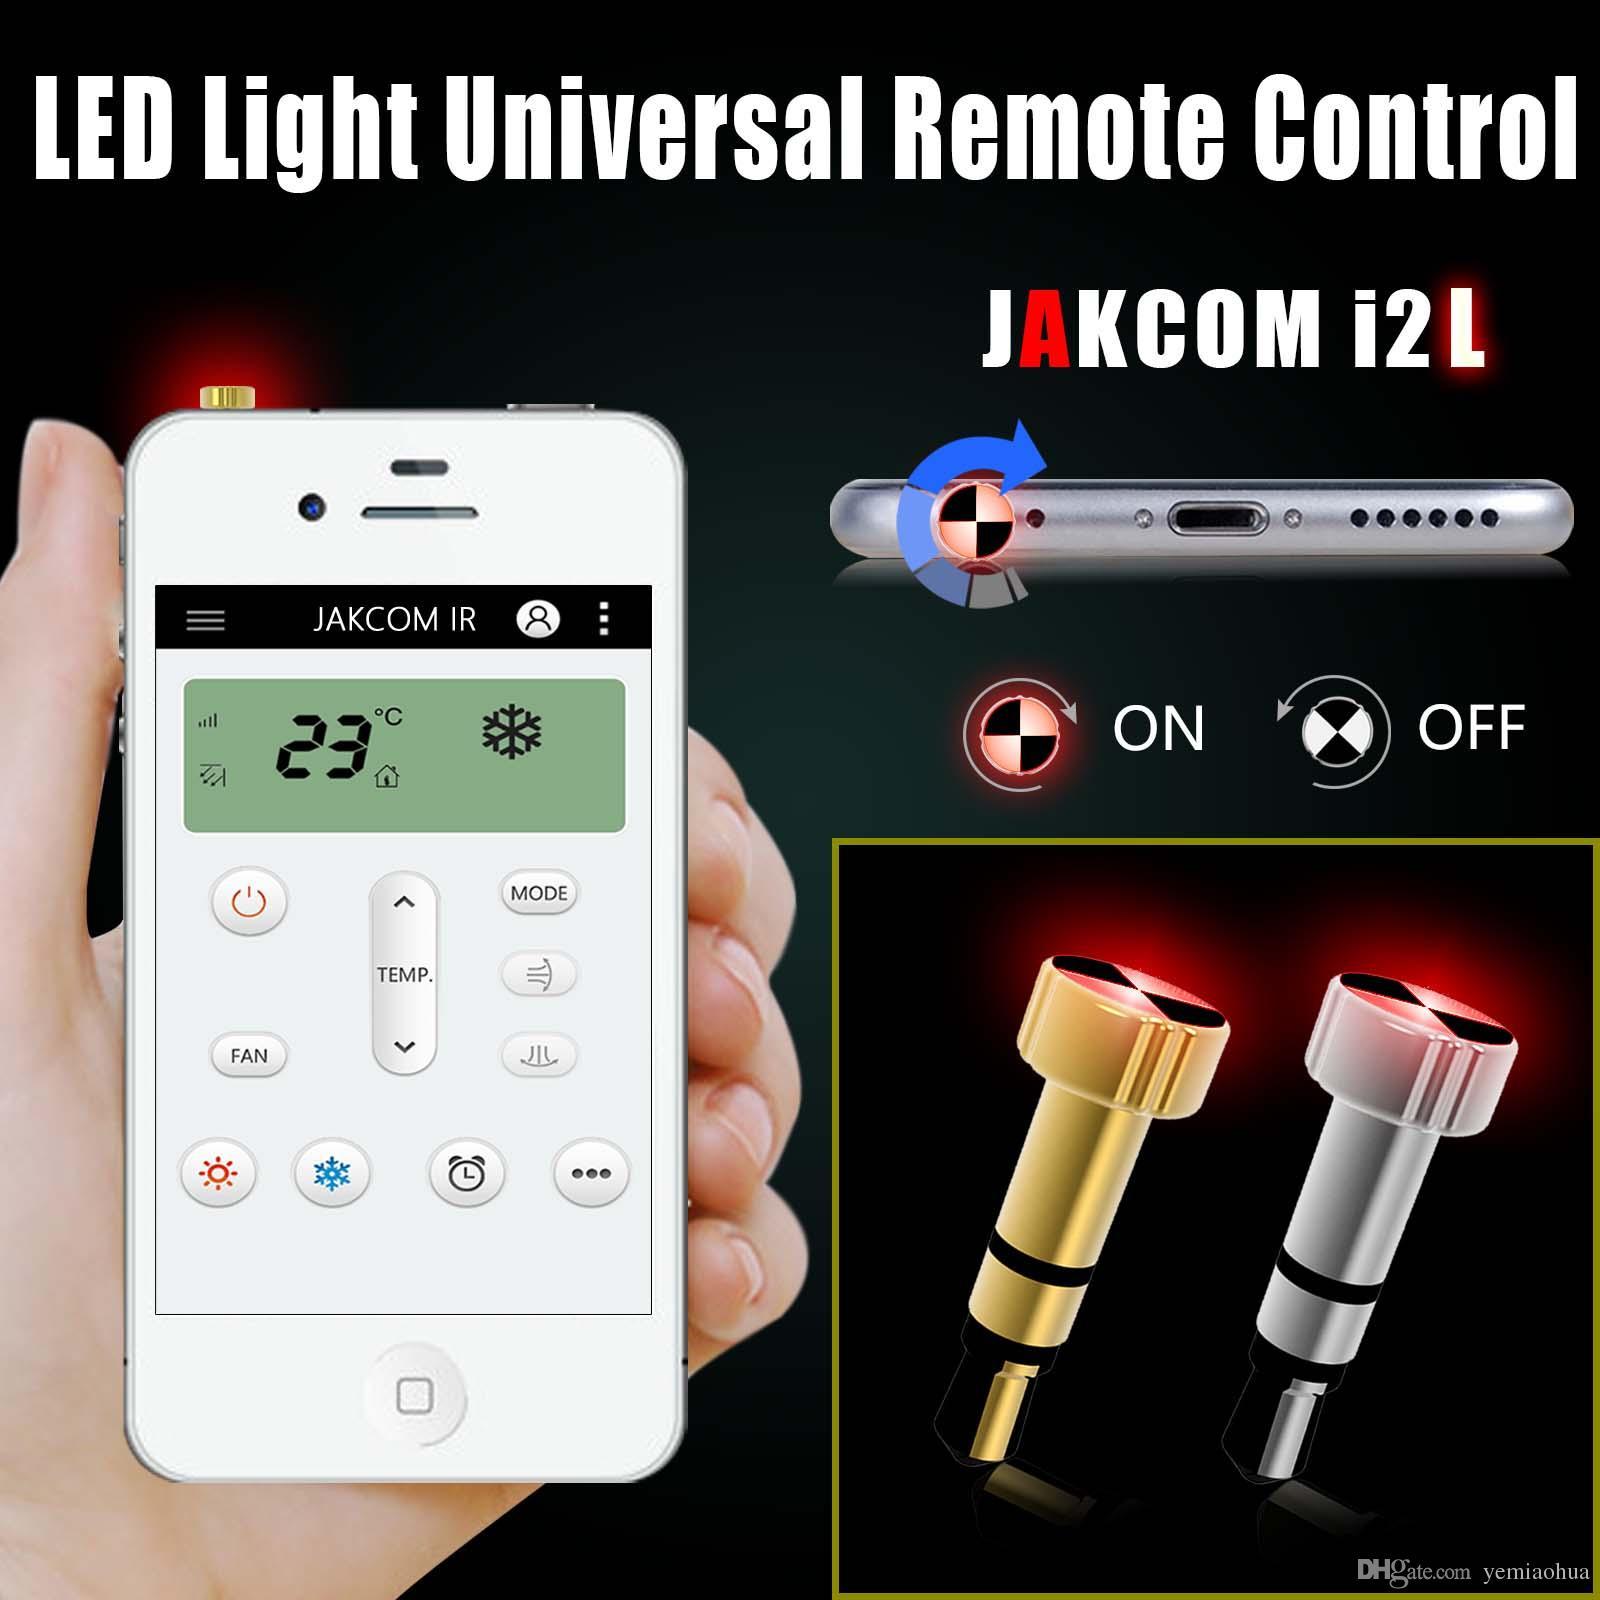 JAKCOM LED Infrarrojo Inteligente Universal Remoto Anti-Polvo Teléfono Celular Gadgets Xiaomi Enchufe de Teléfono Celular Encantos Adi Marca